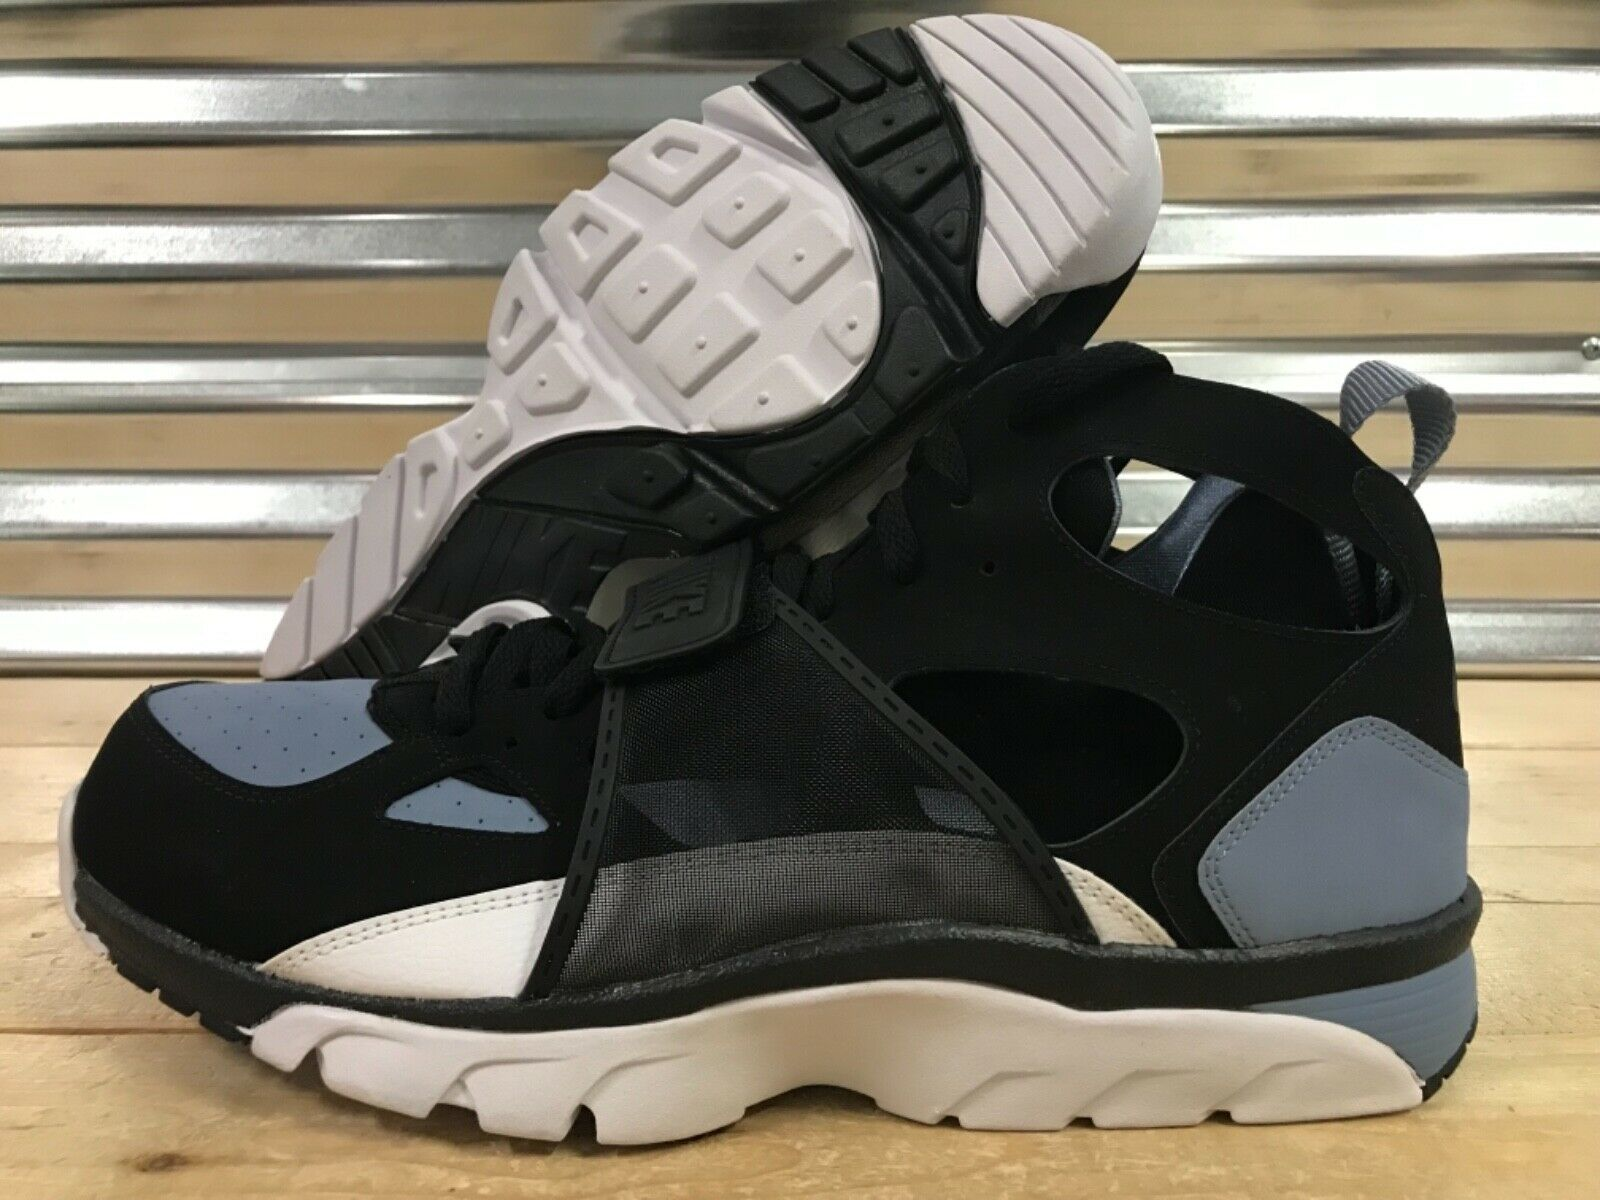 Nike Air Trainer Huarache Mid Running scarpe nero Cool Cool Cool blu SZ 15 ( 679083-016 ) 2c6405